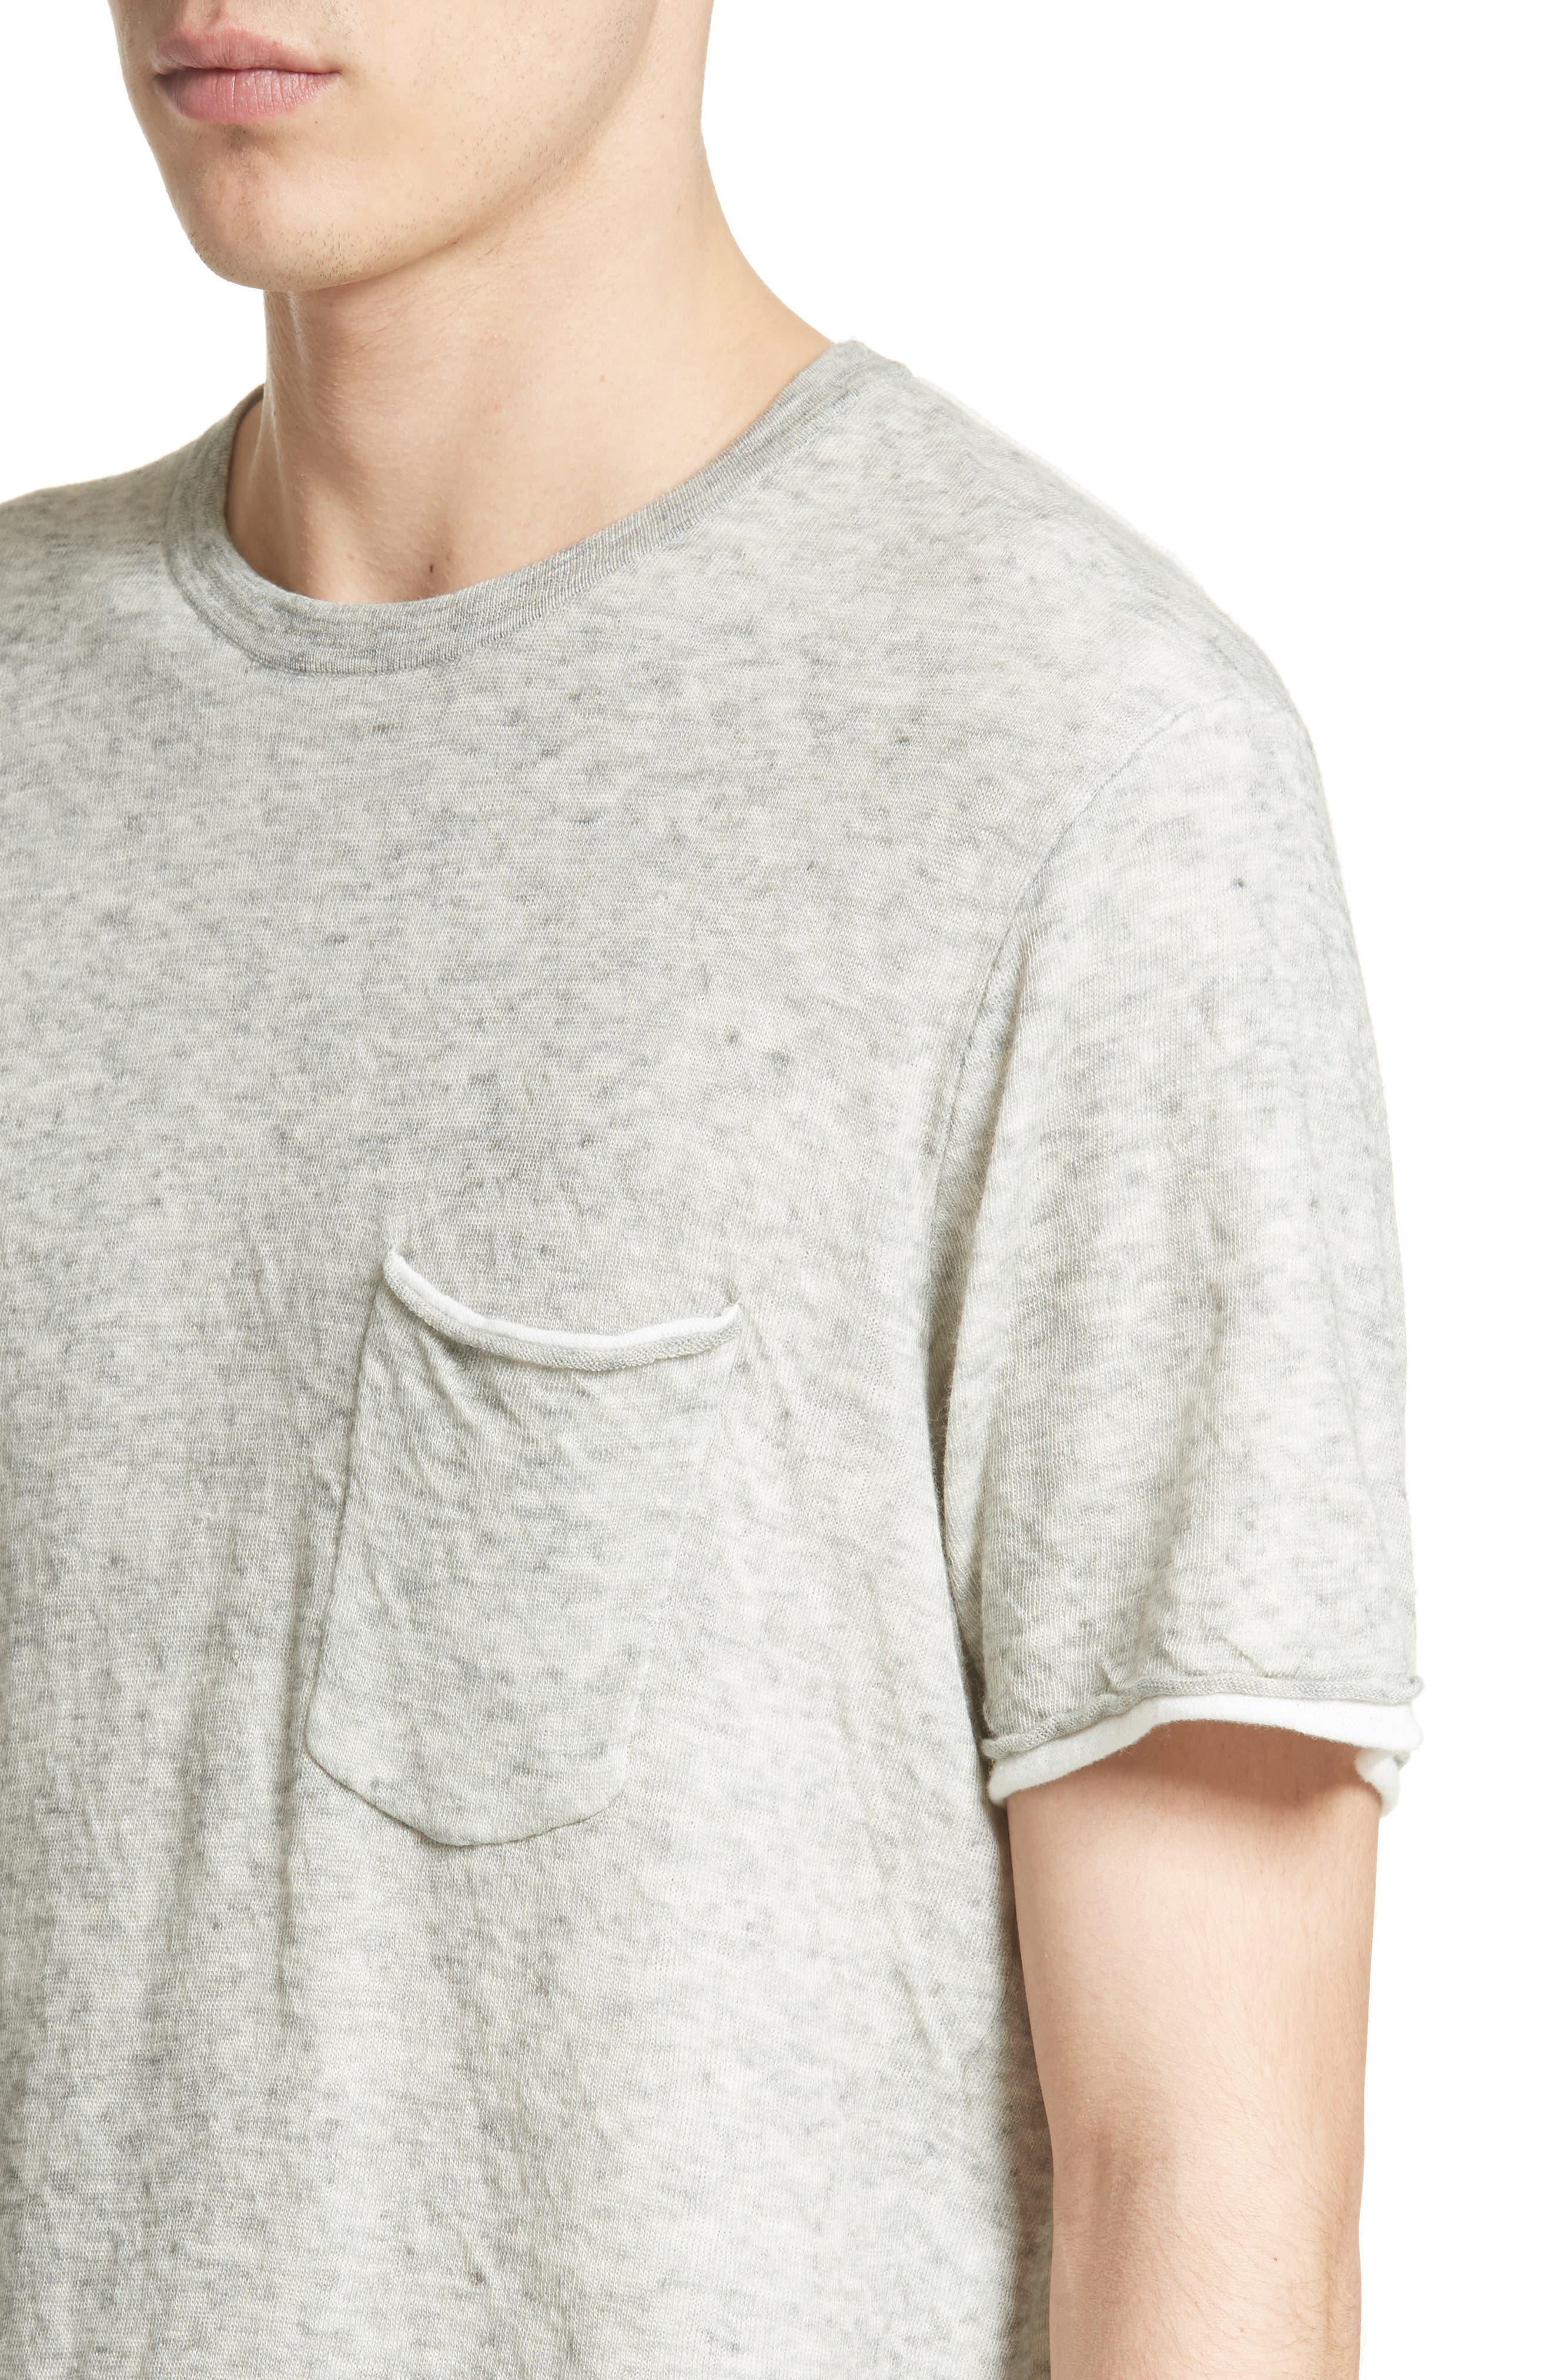 Tripp Cotton & Wool T-Shirt,                             Alternate thumbnail 4, color,                             068